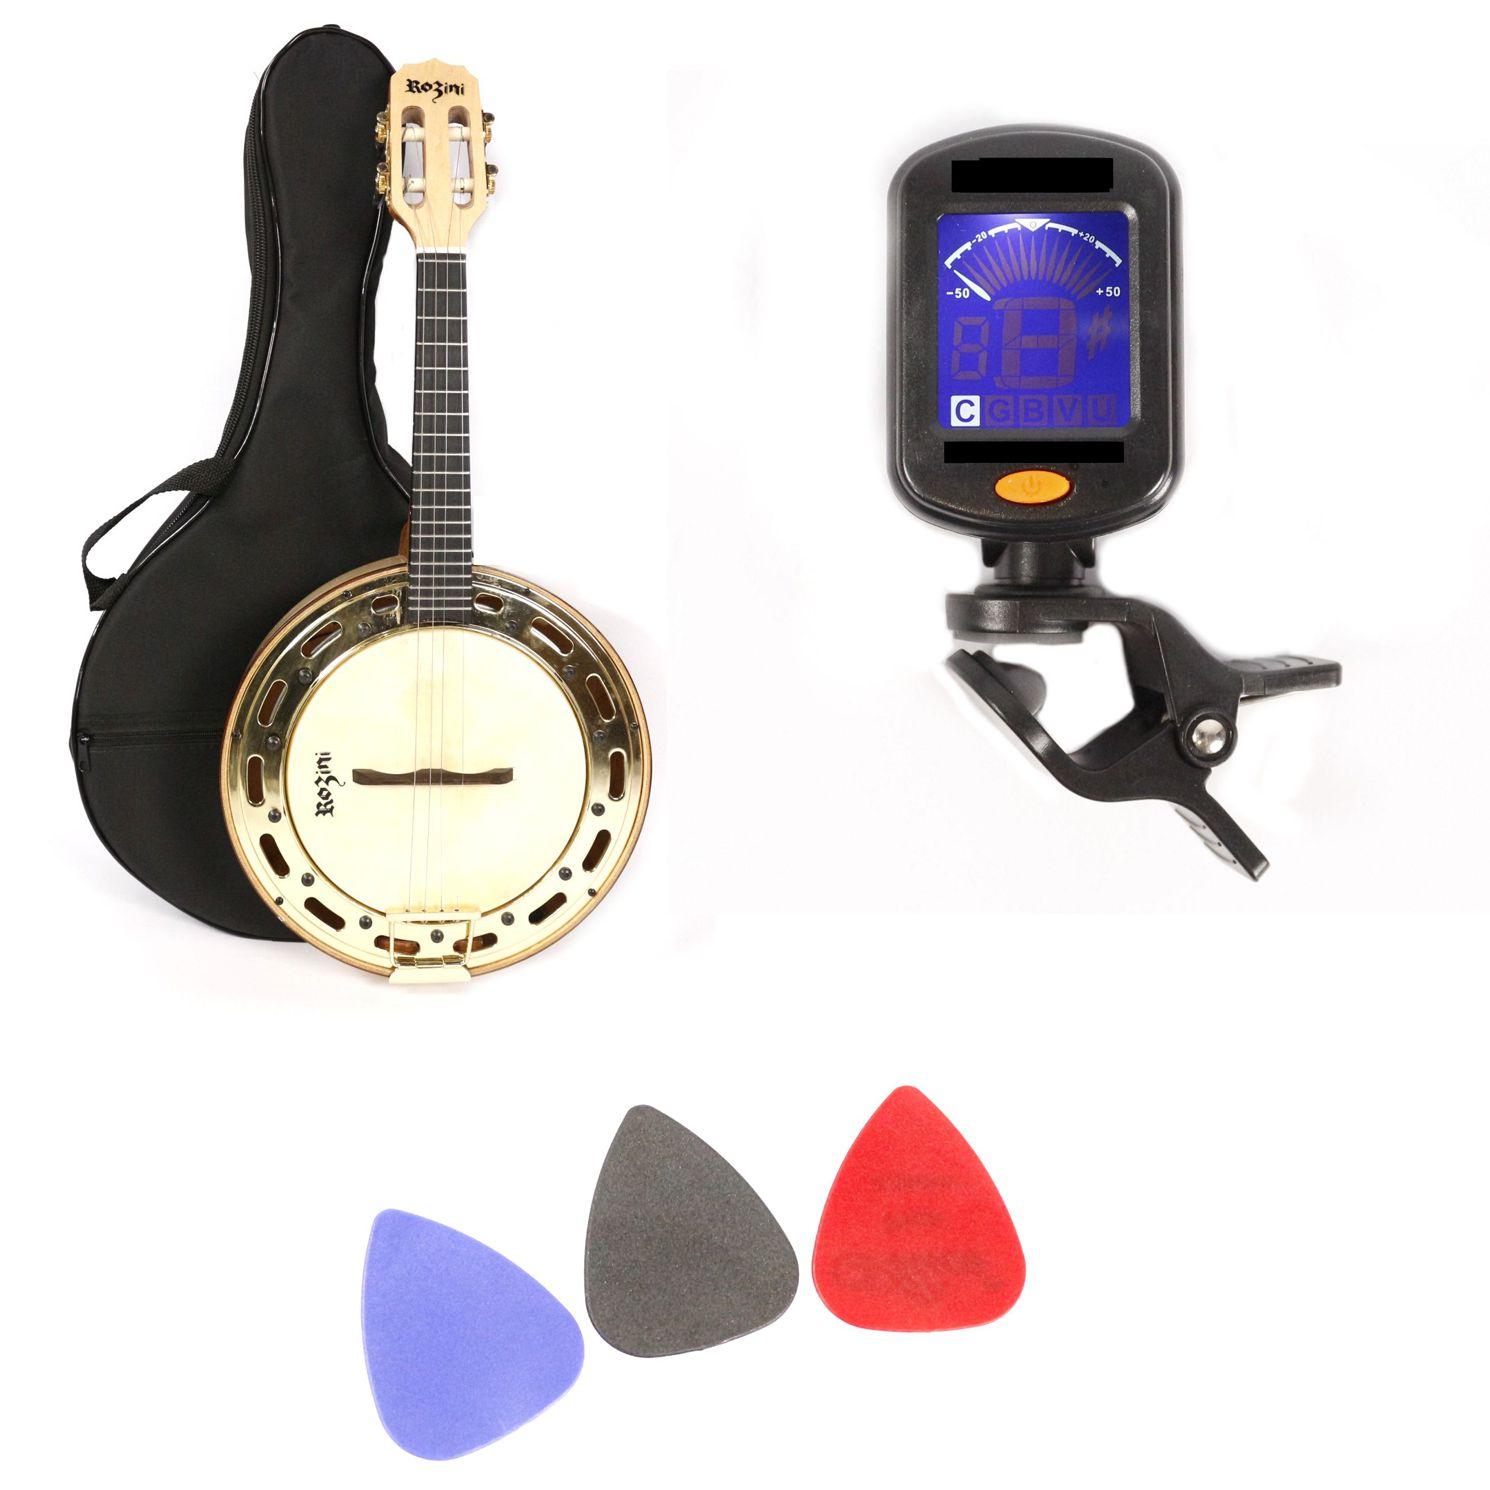 Kit Banjo Profissional Elétrico Claro Rozini com Capa, Palhetas e Afinador RJ13